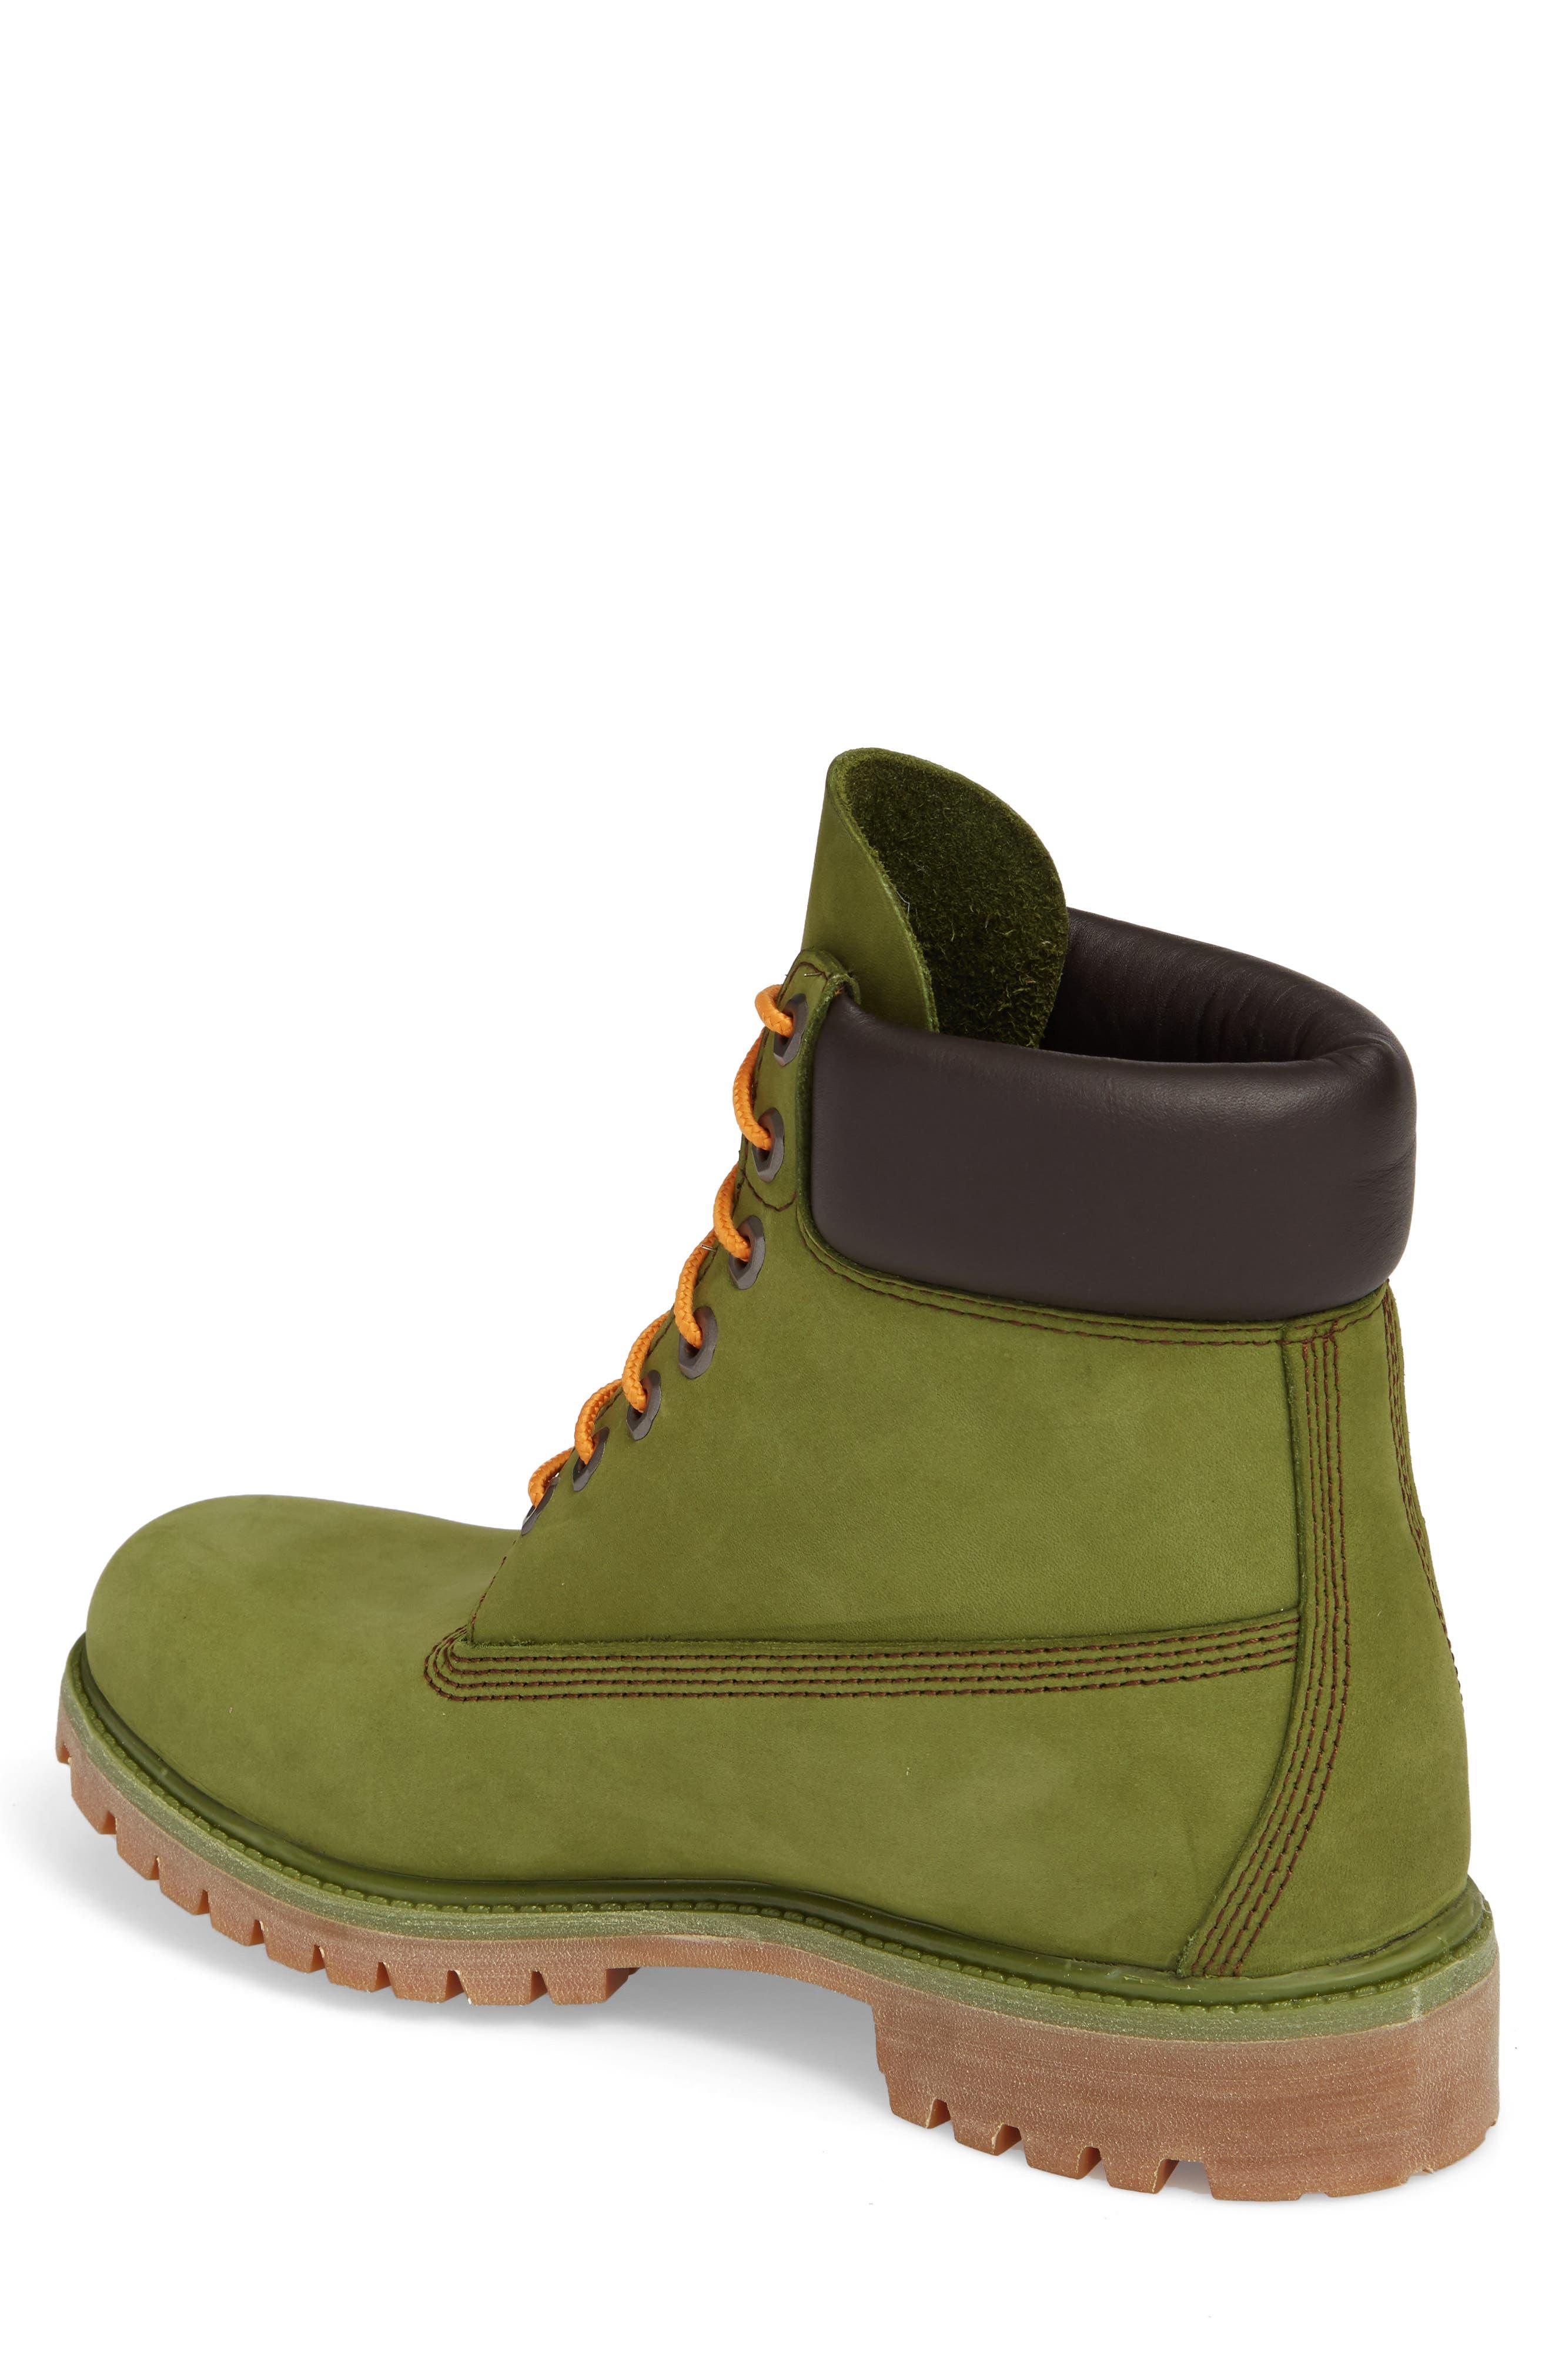 'Six Inch Classic Boots Series - Premium' Boot,                             Alternate thumbnail 2, color,                             PESTO WATERBUCK